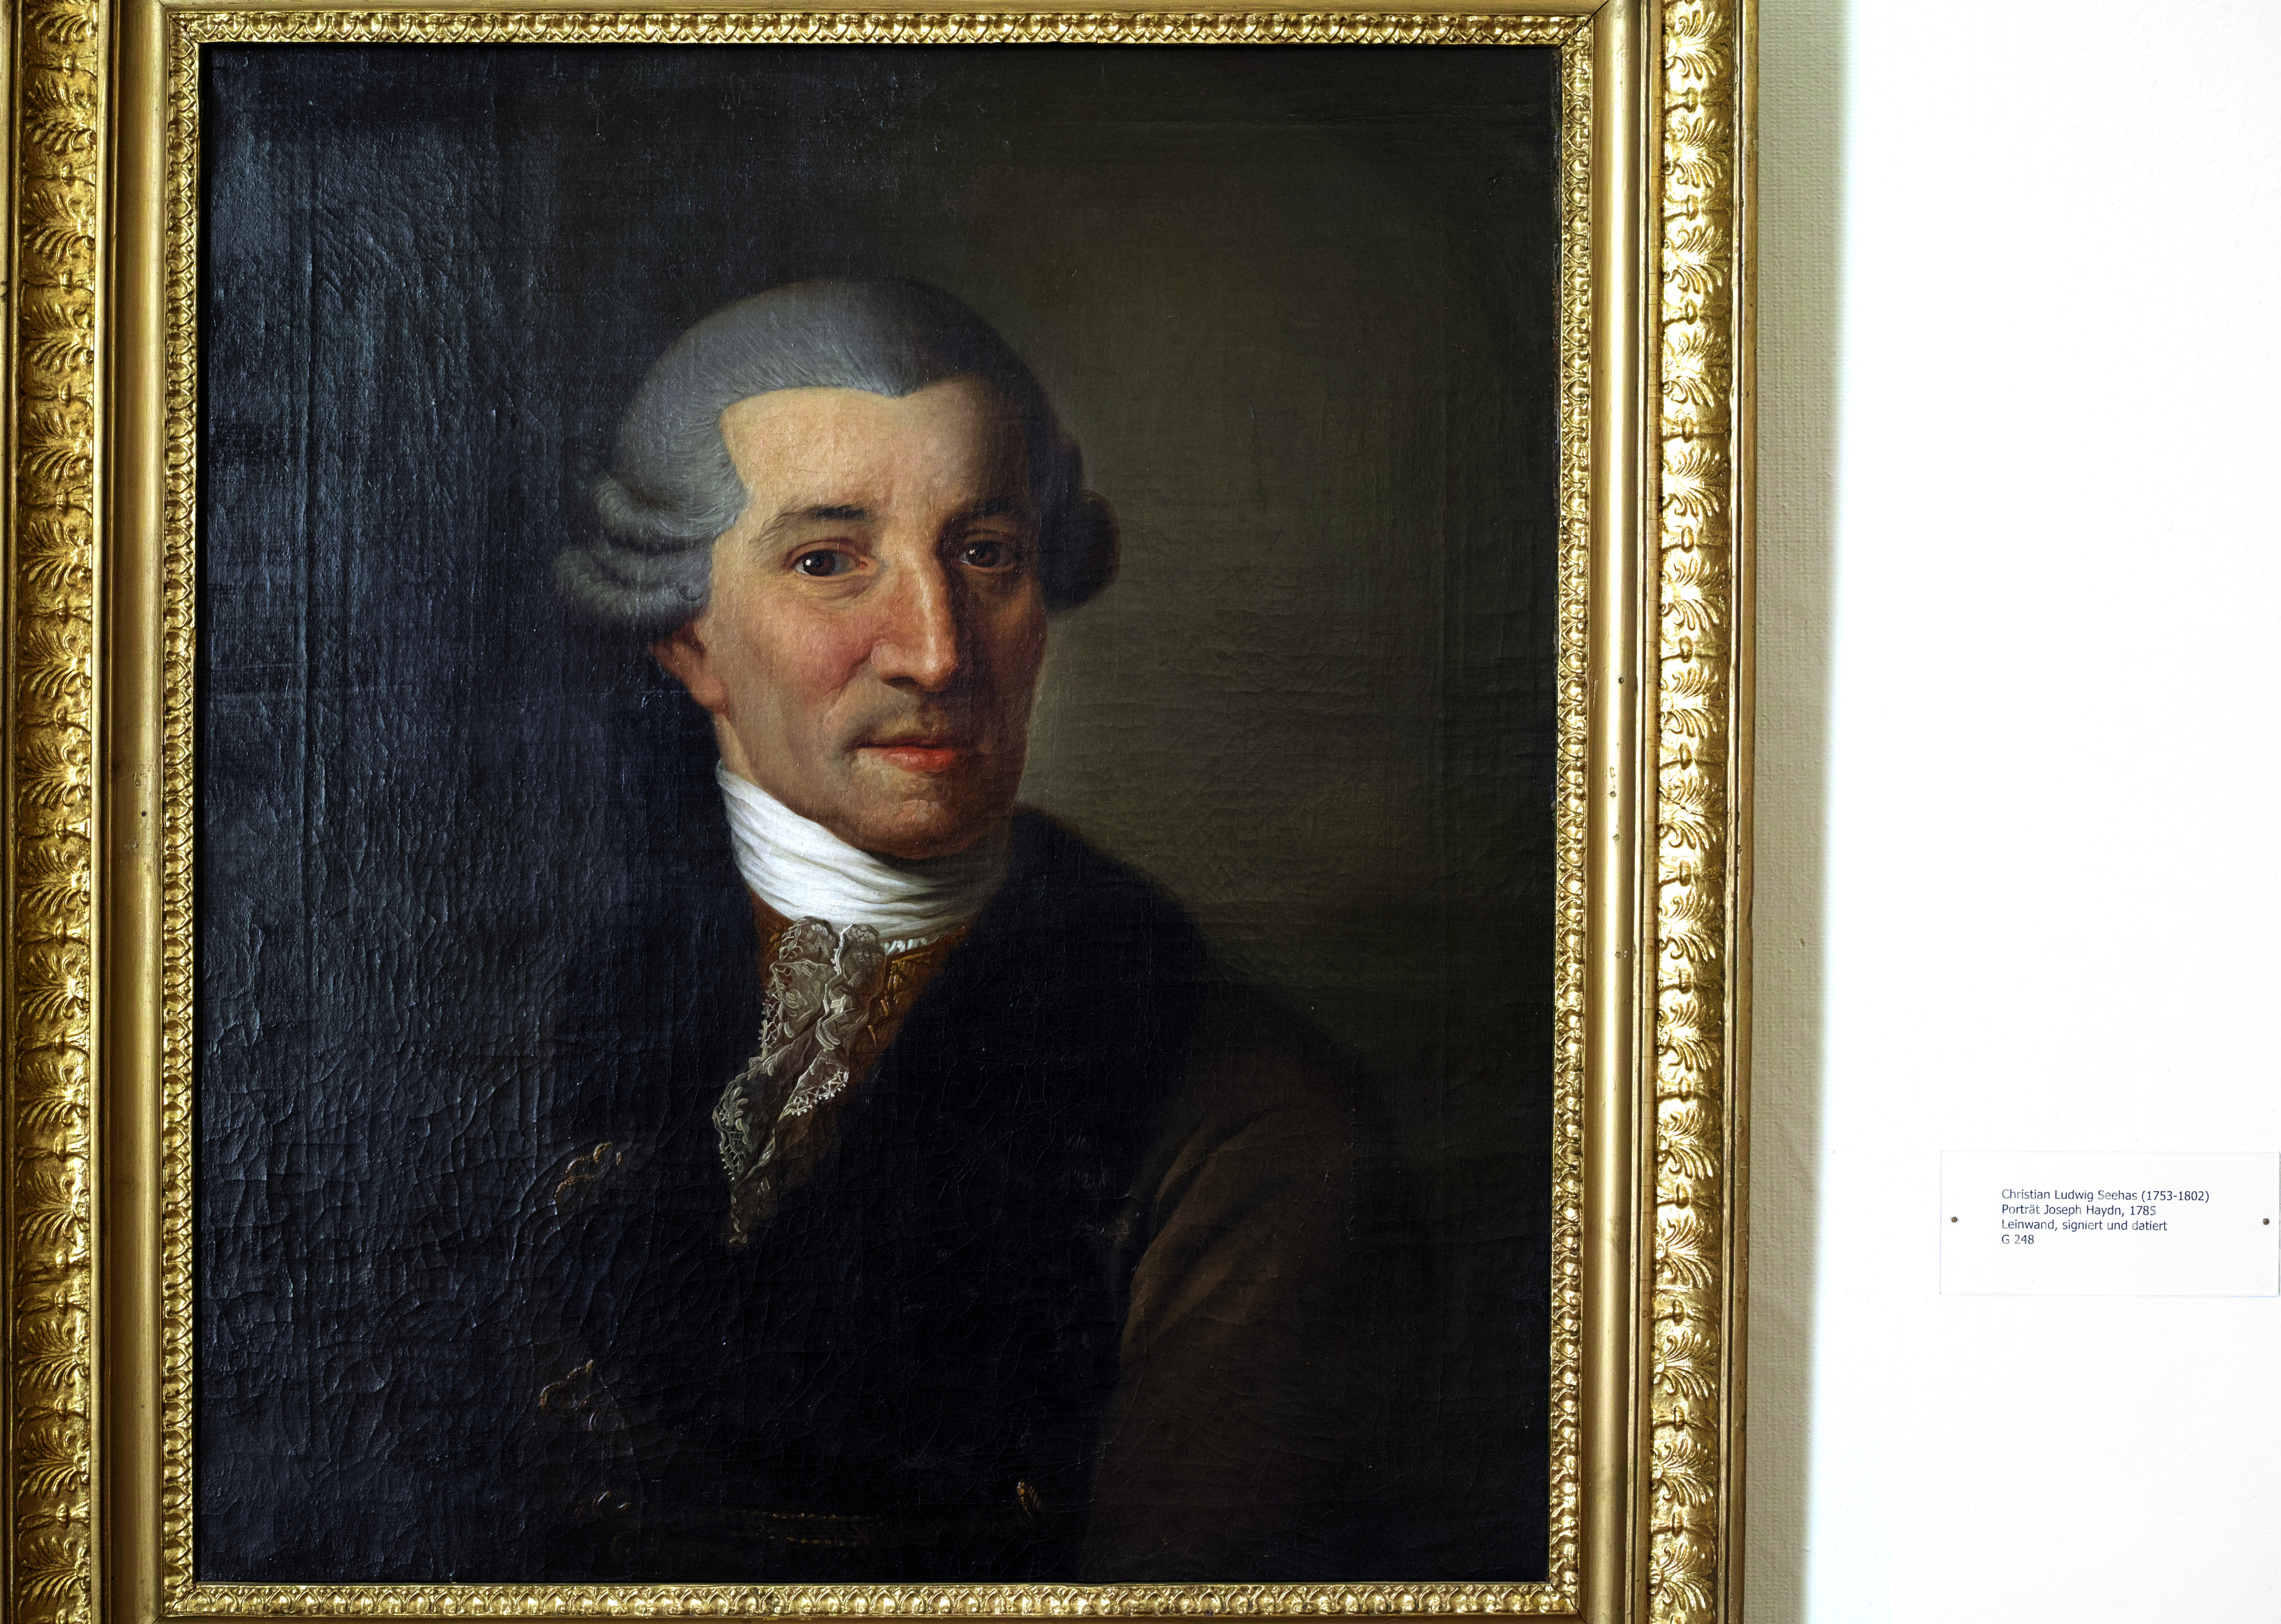 FileJoseph Haydn SchlossLWL